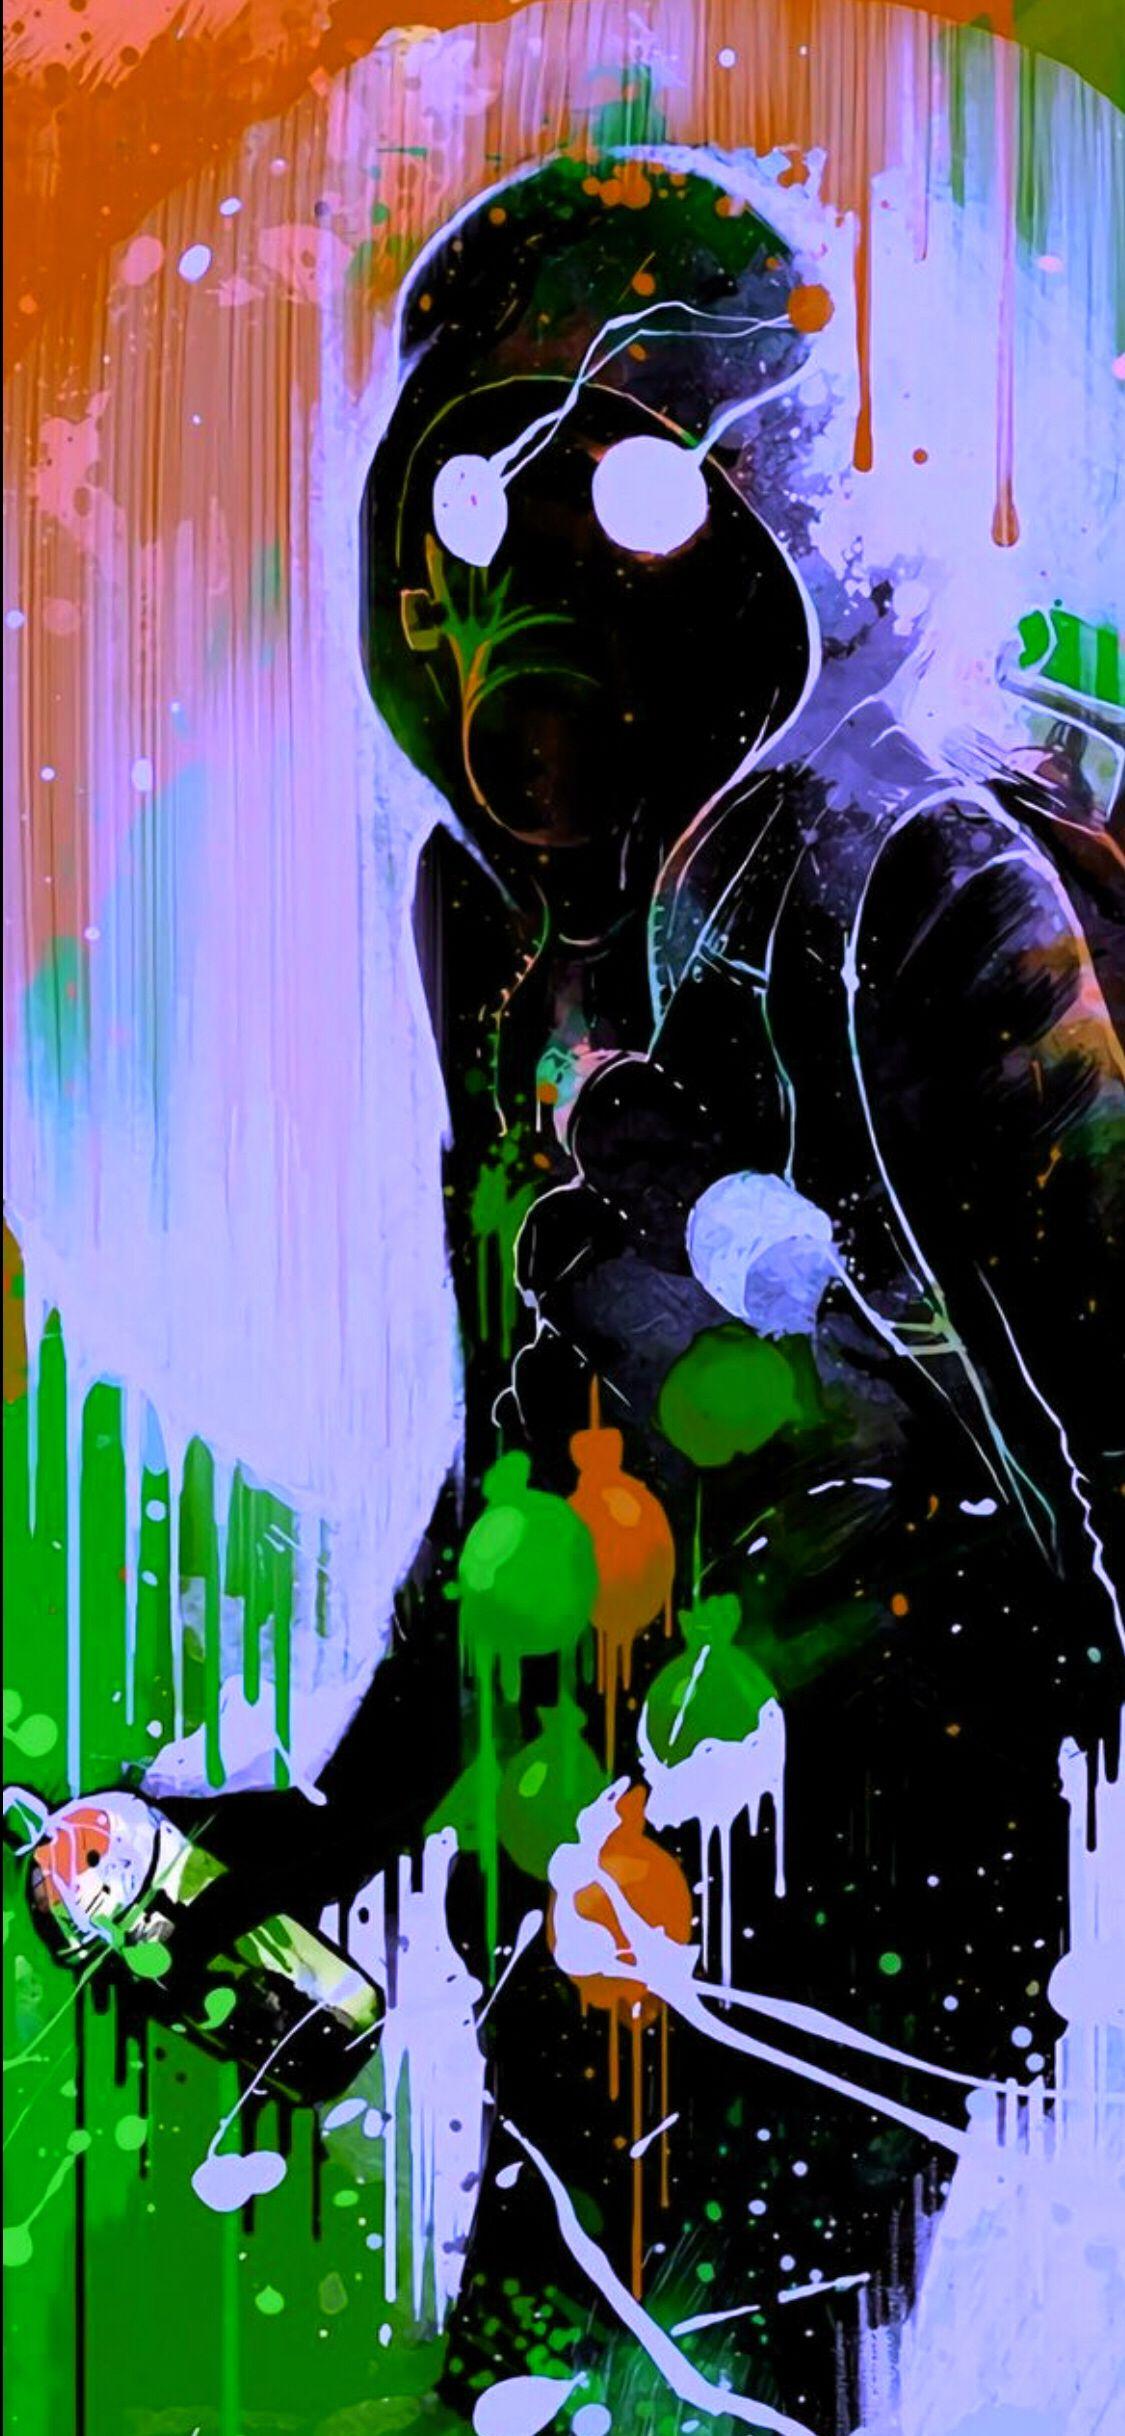 Wallpaper Iphone X Seni